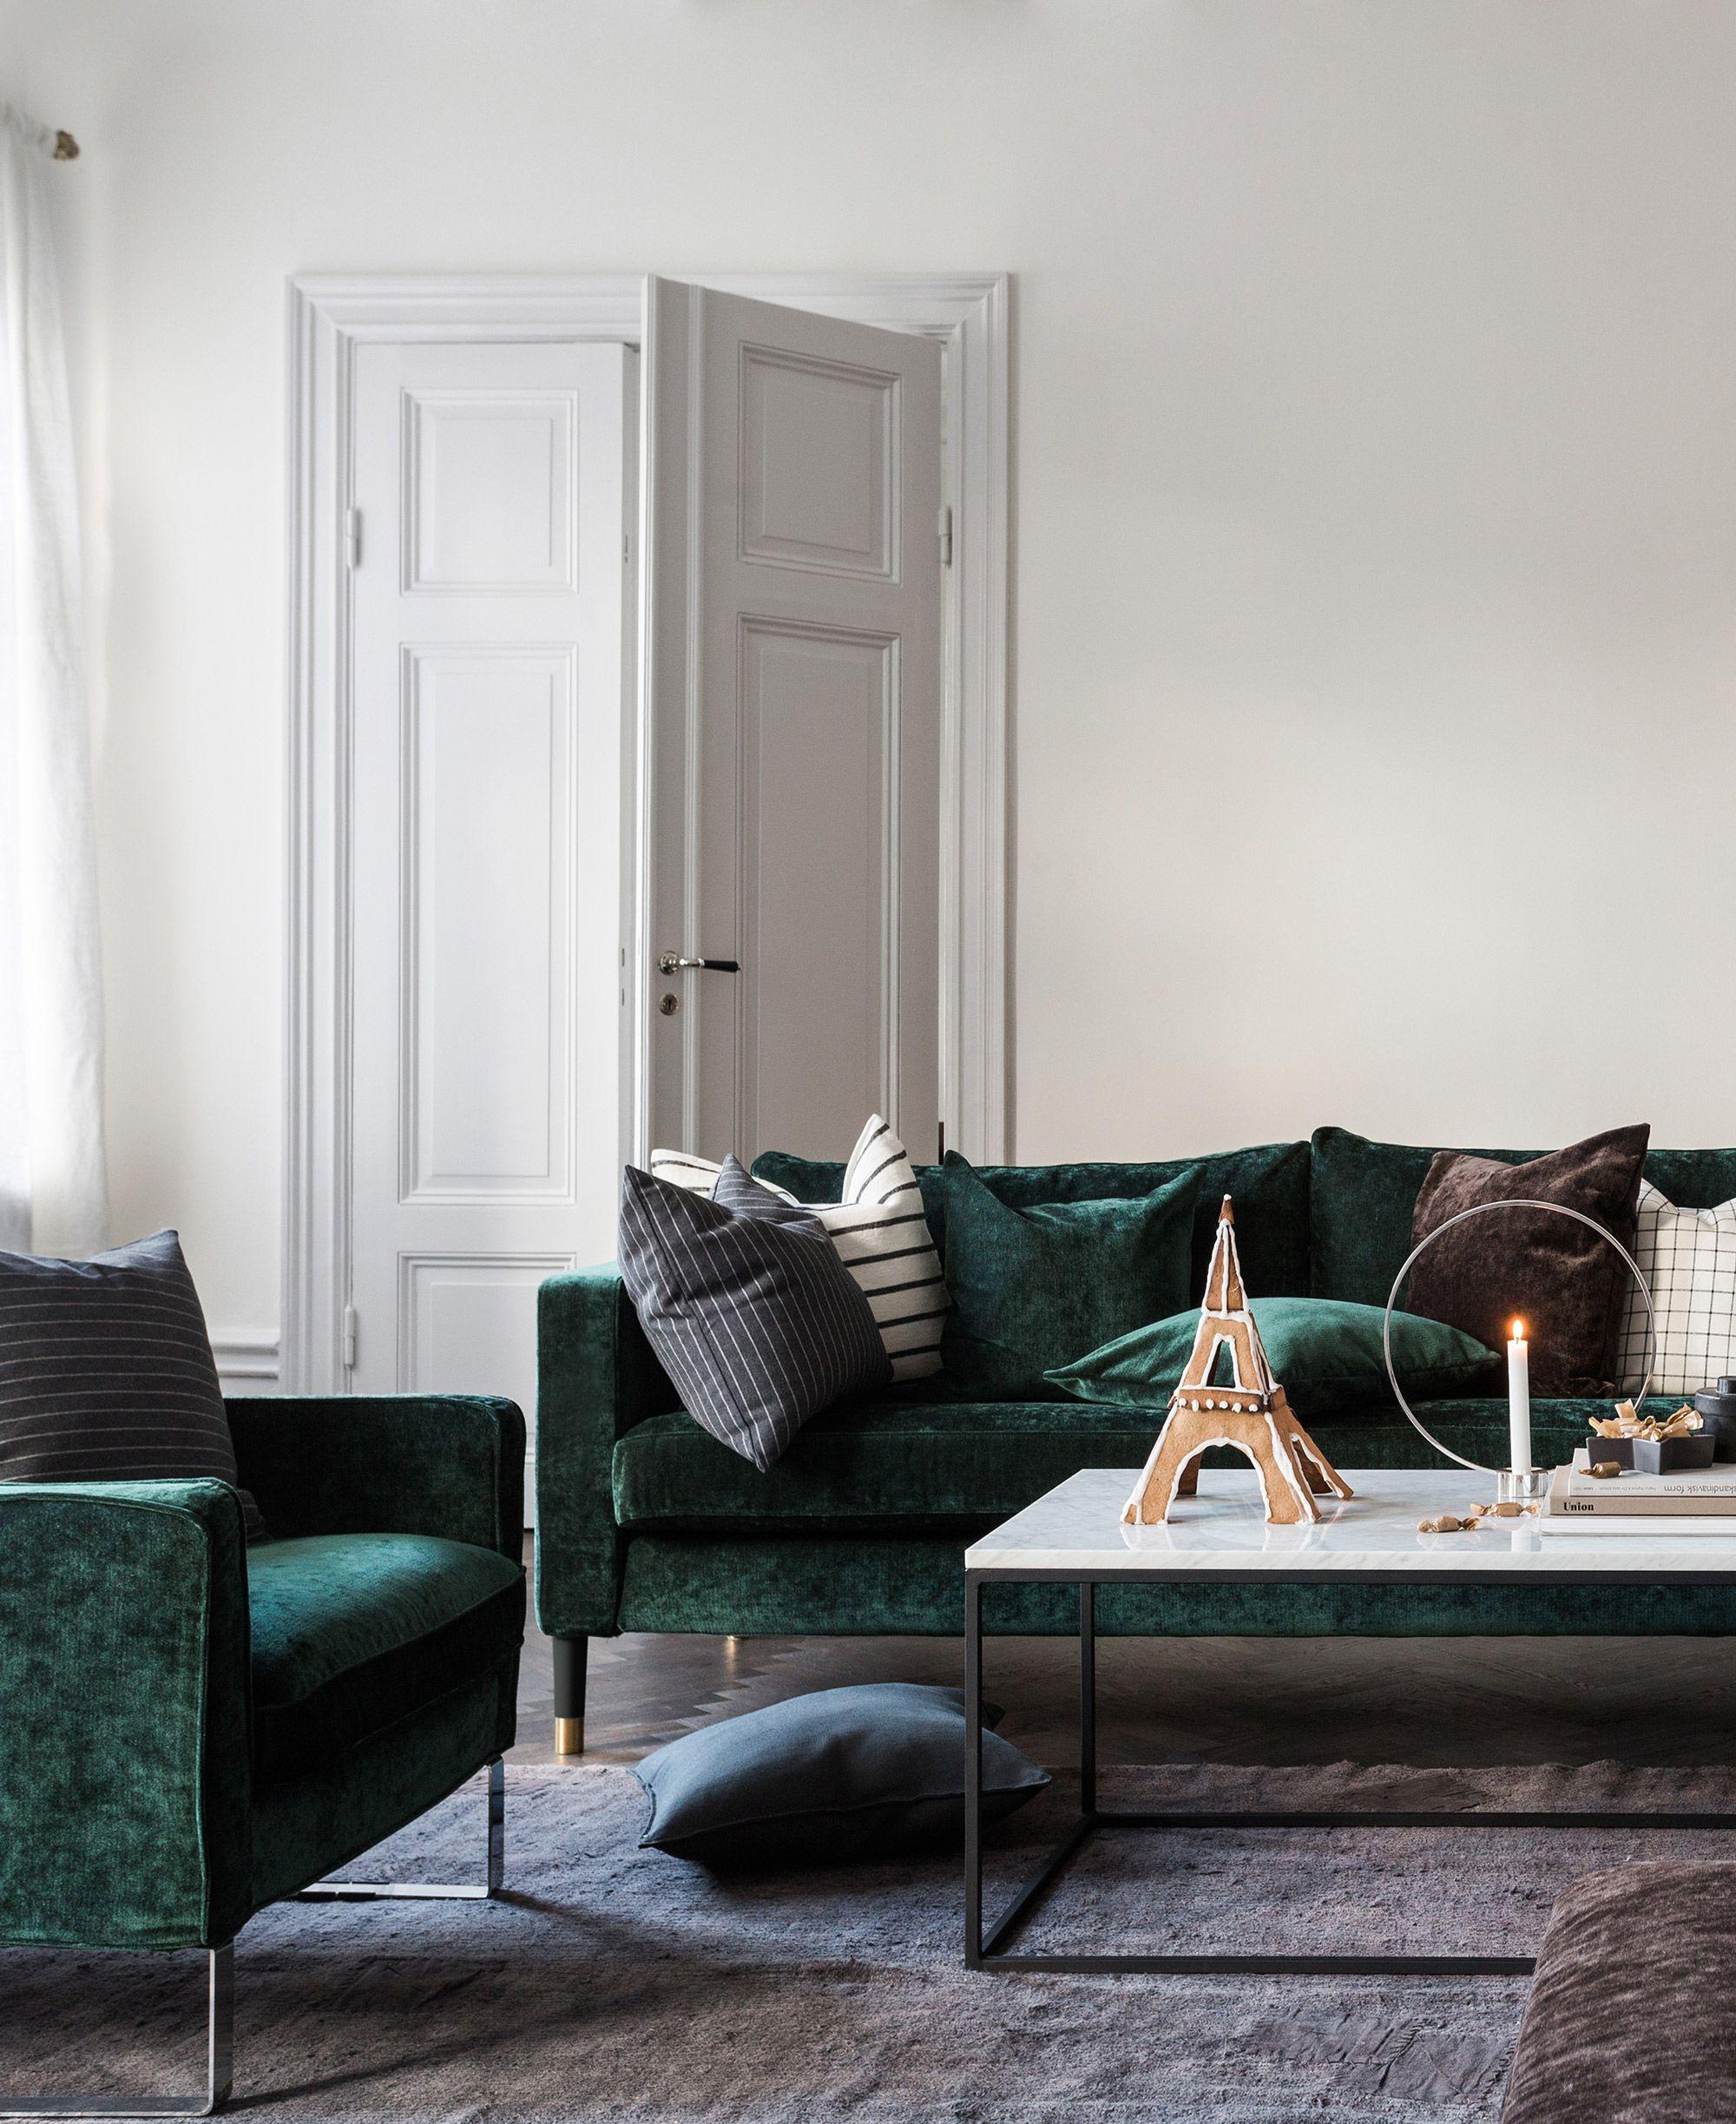 Ikea Uk Living Room Furniture: Karlstad, 3 Seater Sofa Cover